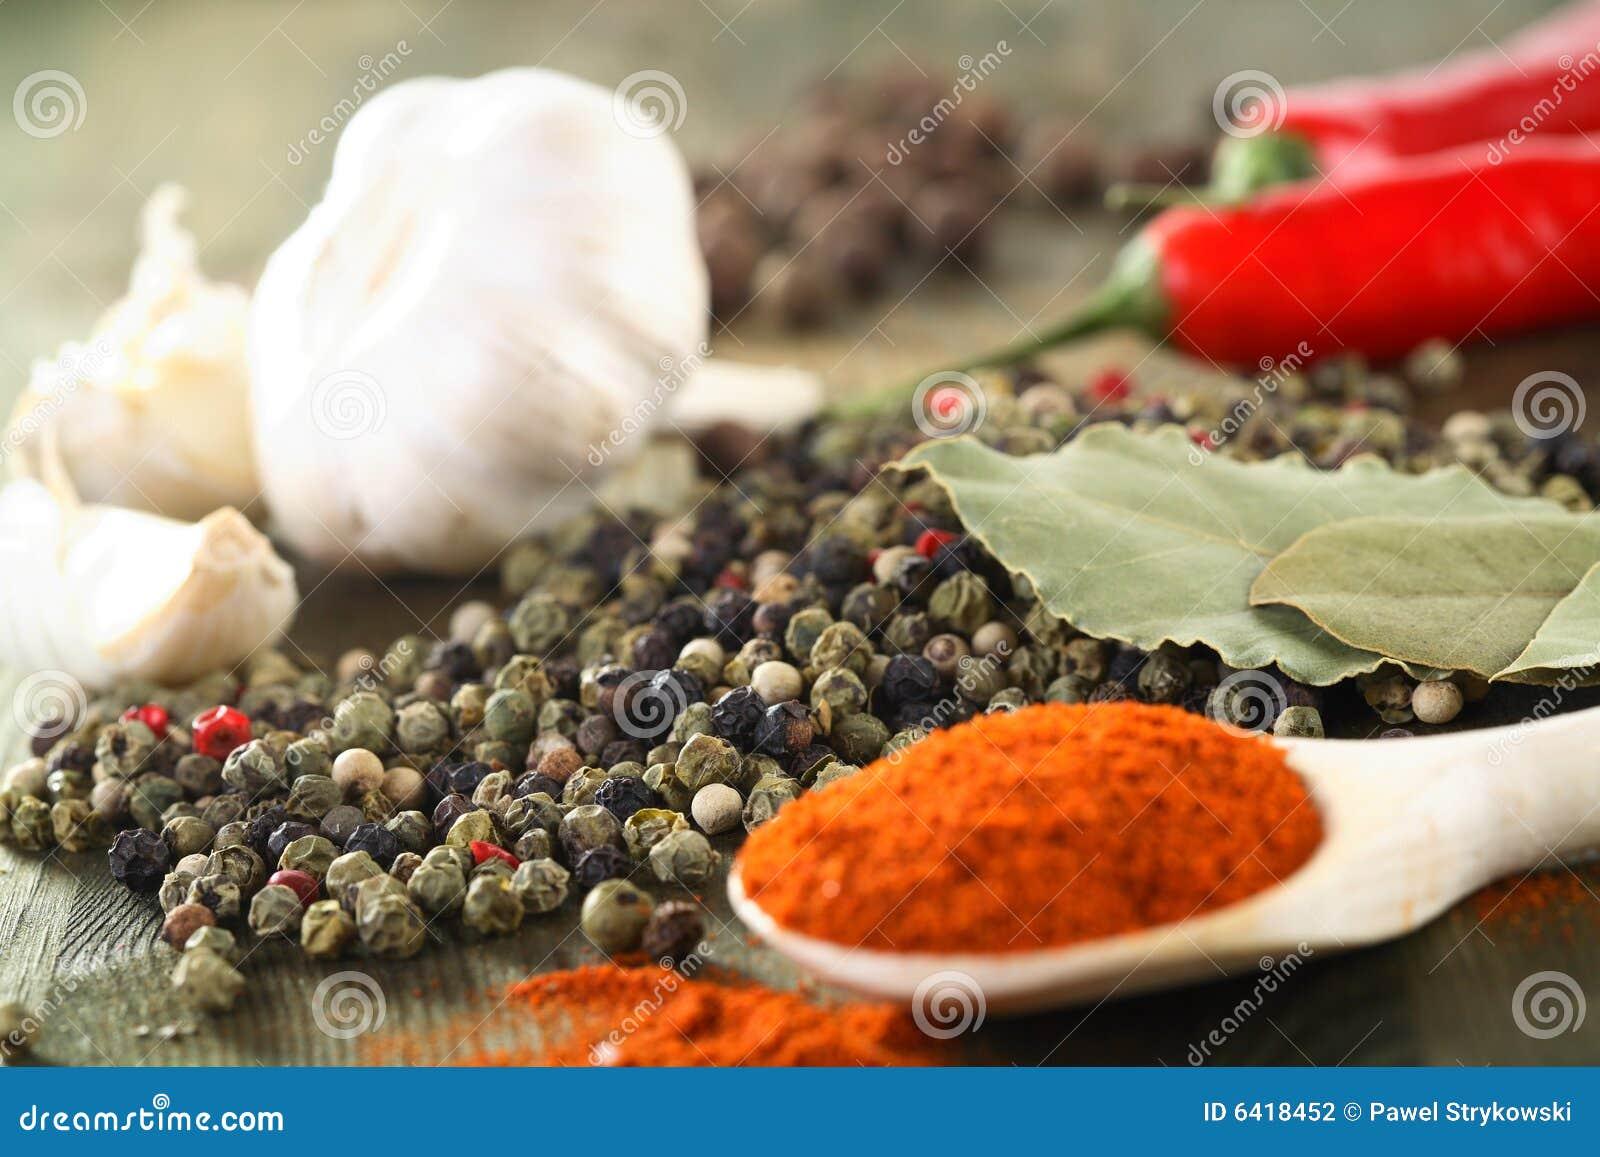 Czosnek chili pepper